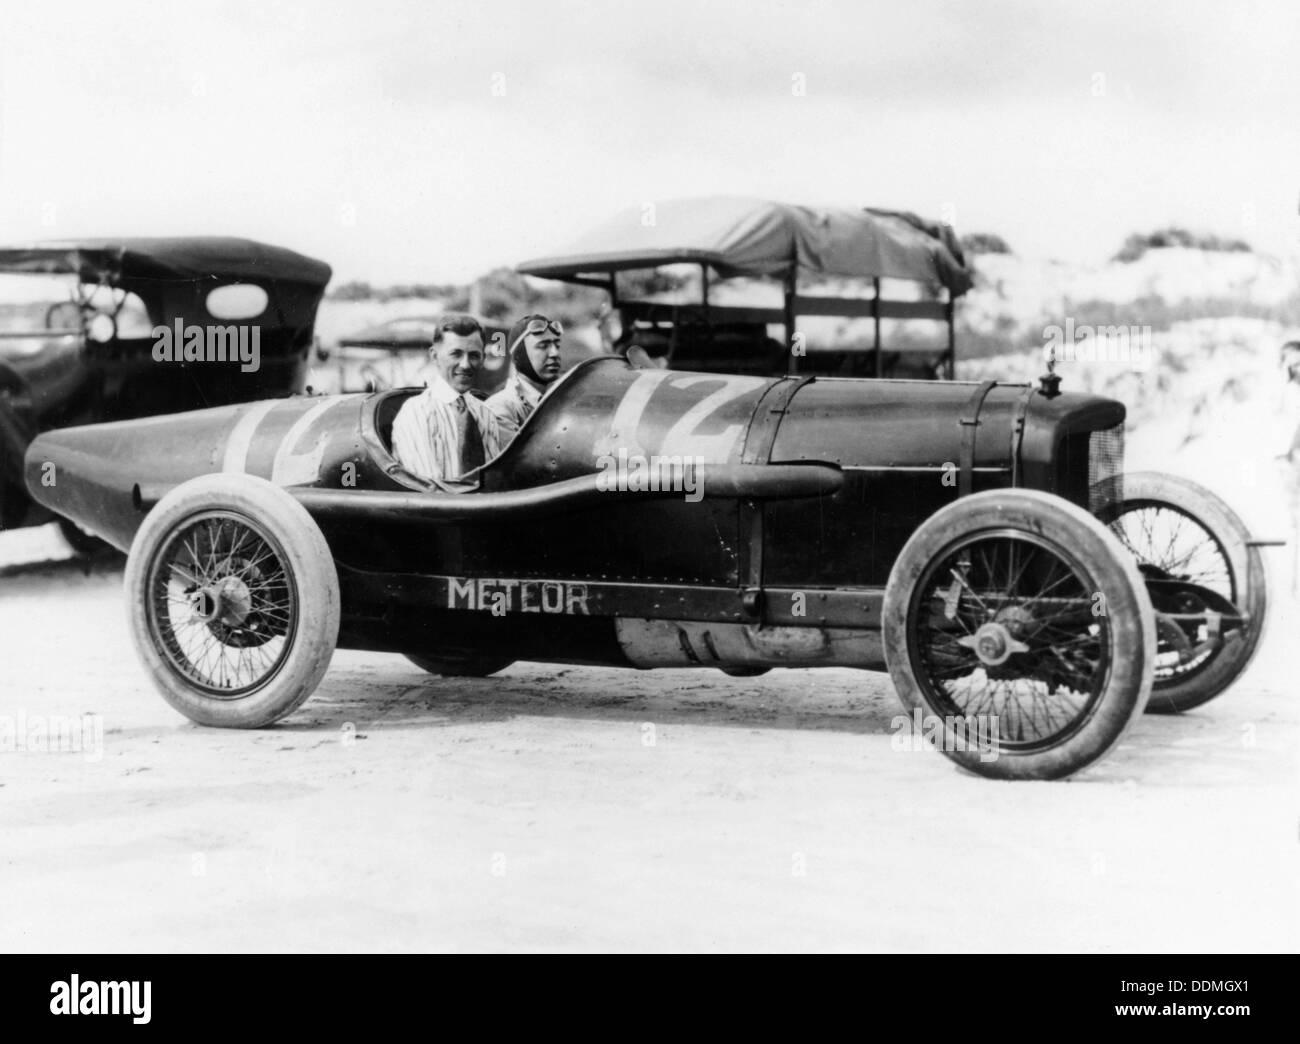 Jimmy Murphy in Duesenberg racing car, c1920. - Stock Image